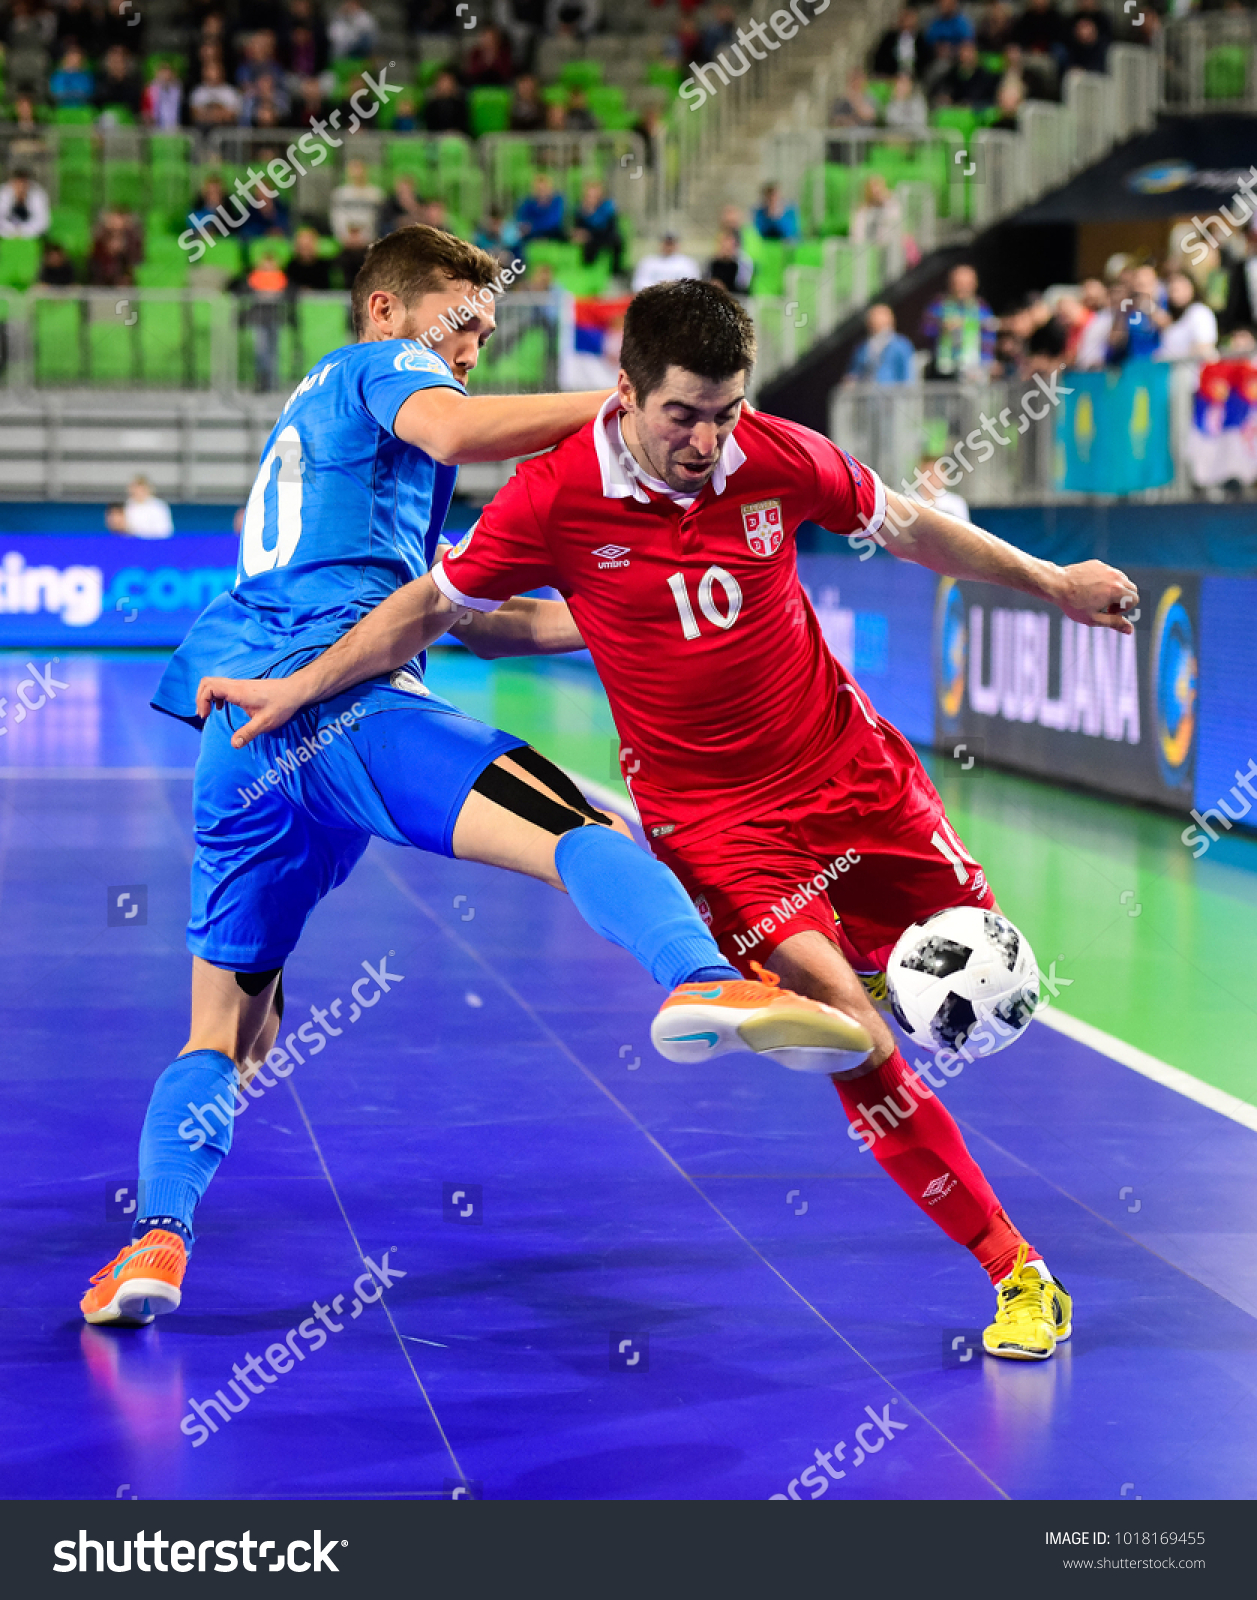 ab417da800fac Chingiz Yesenamanov (L) of Kazakhstan vies with Mladen Kocic of Serbia  during Serbia vs. Kazakhstan UEFA European Futsal Championship 2018 match  at Arena ...